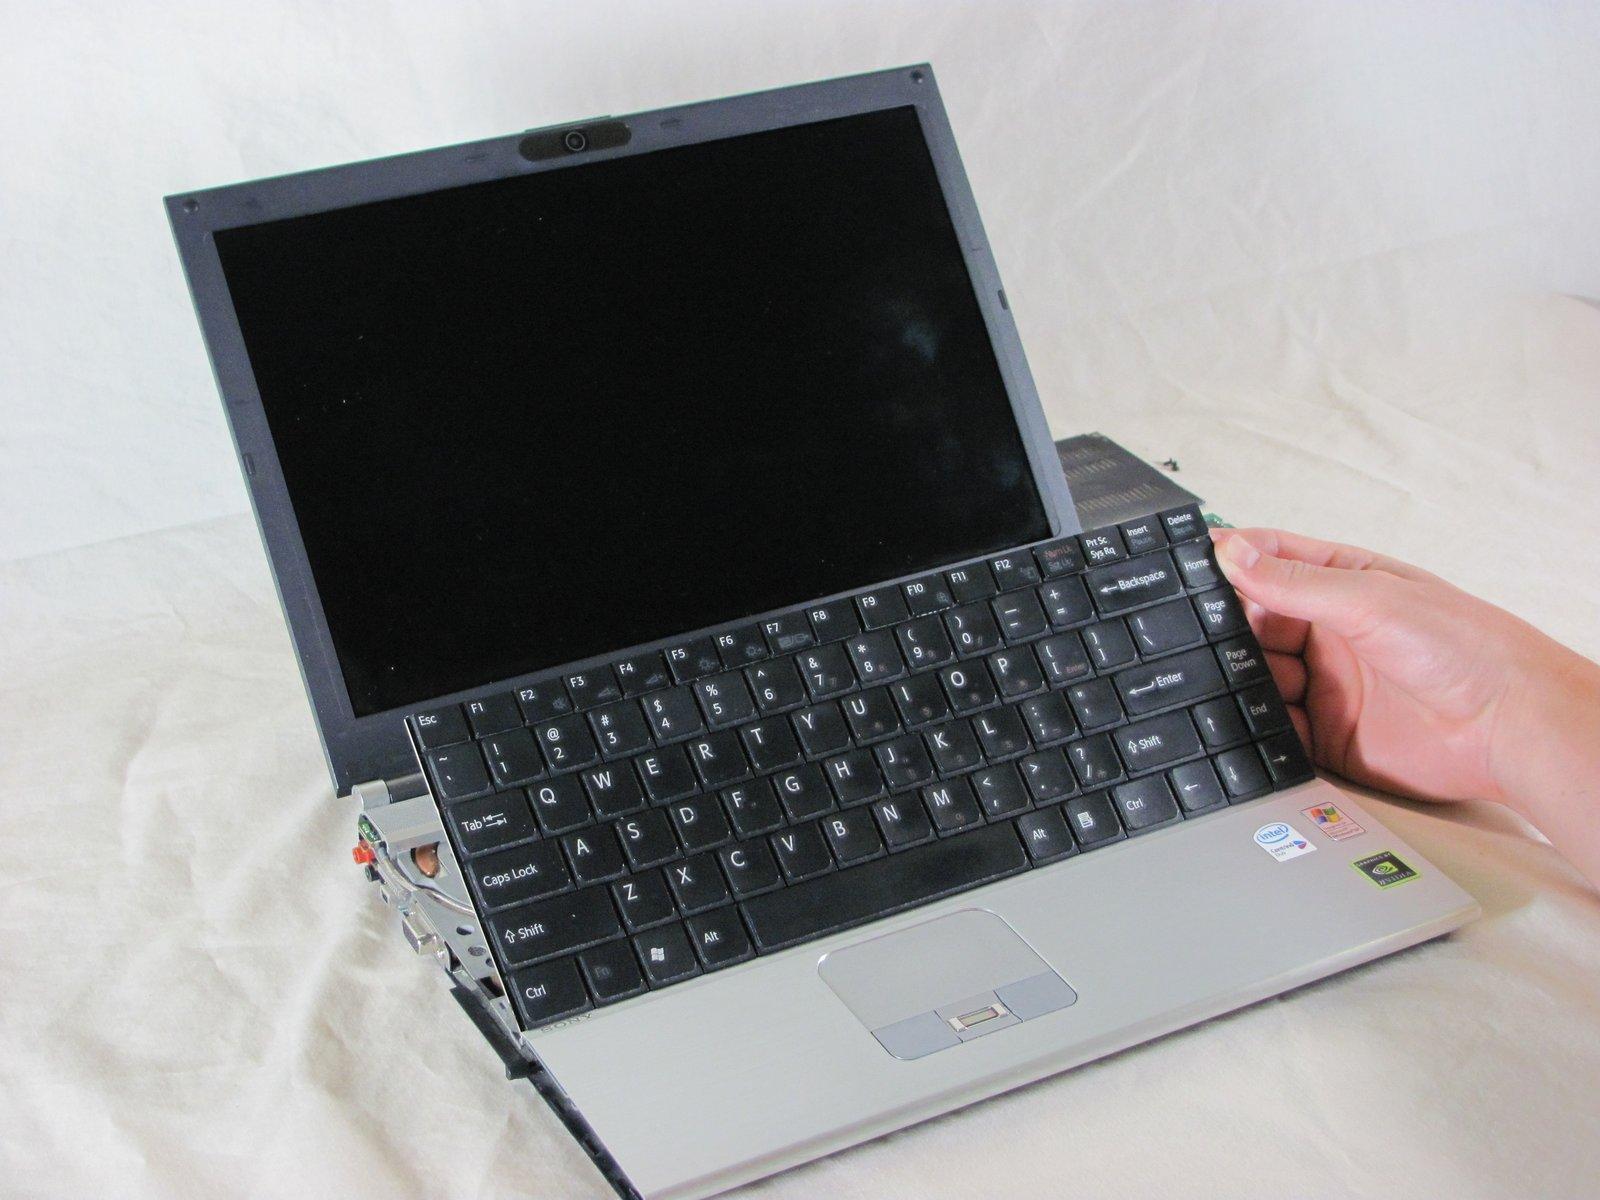 Клавиатура, изъятая из корпуса компьютера